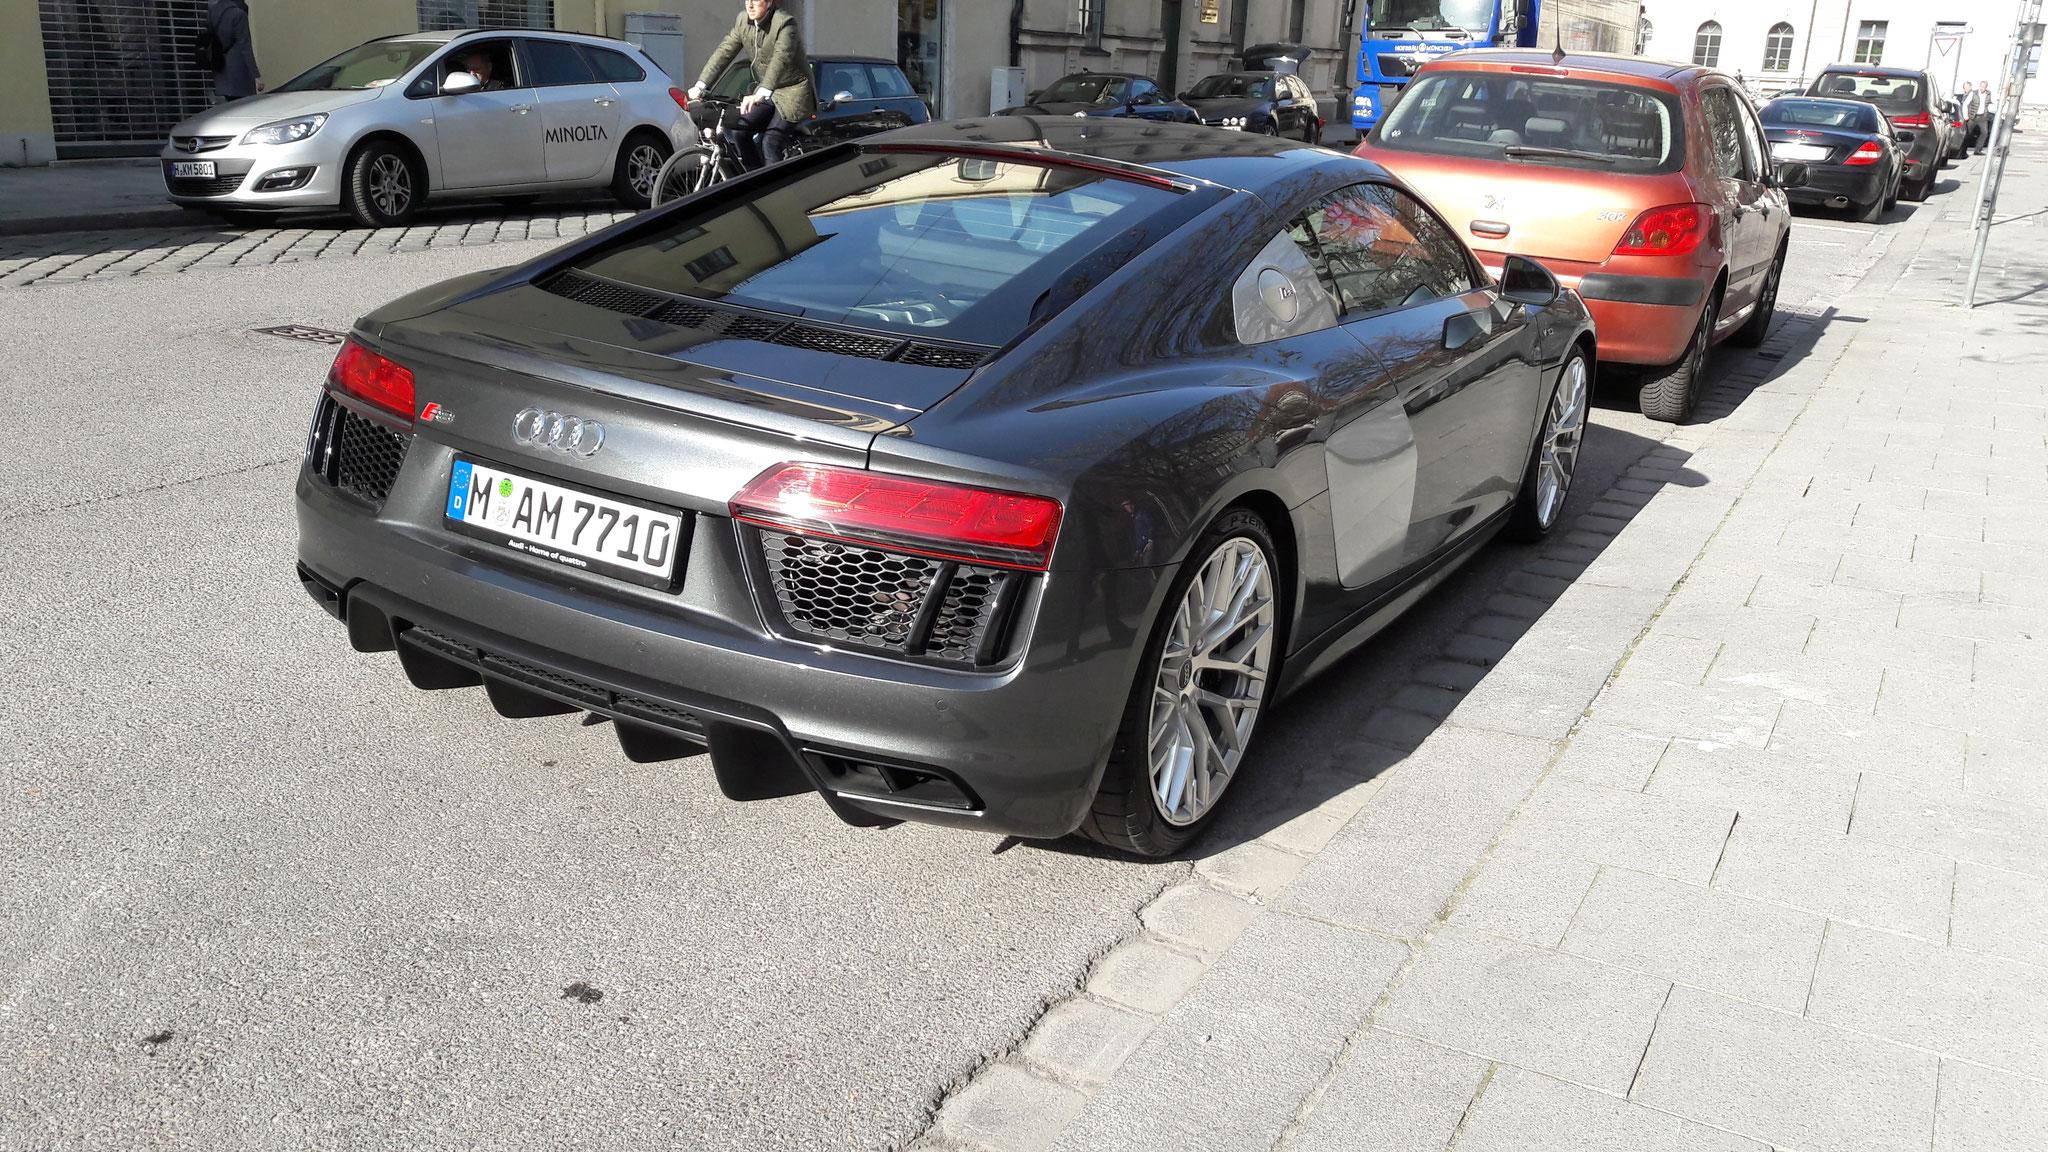 Audi R8 V10 - M-AM-7710